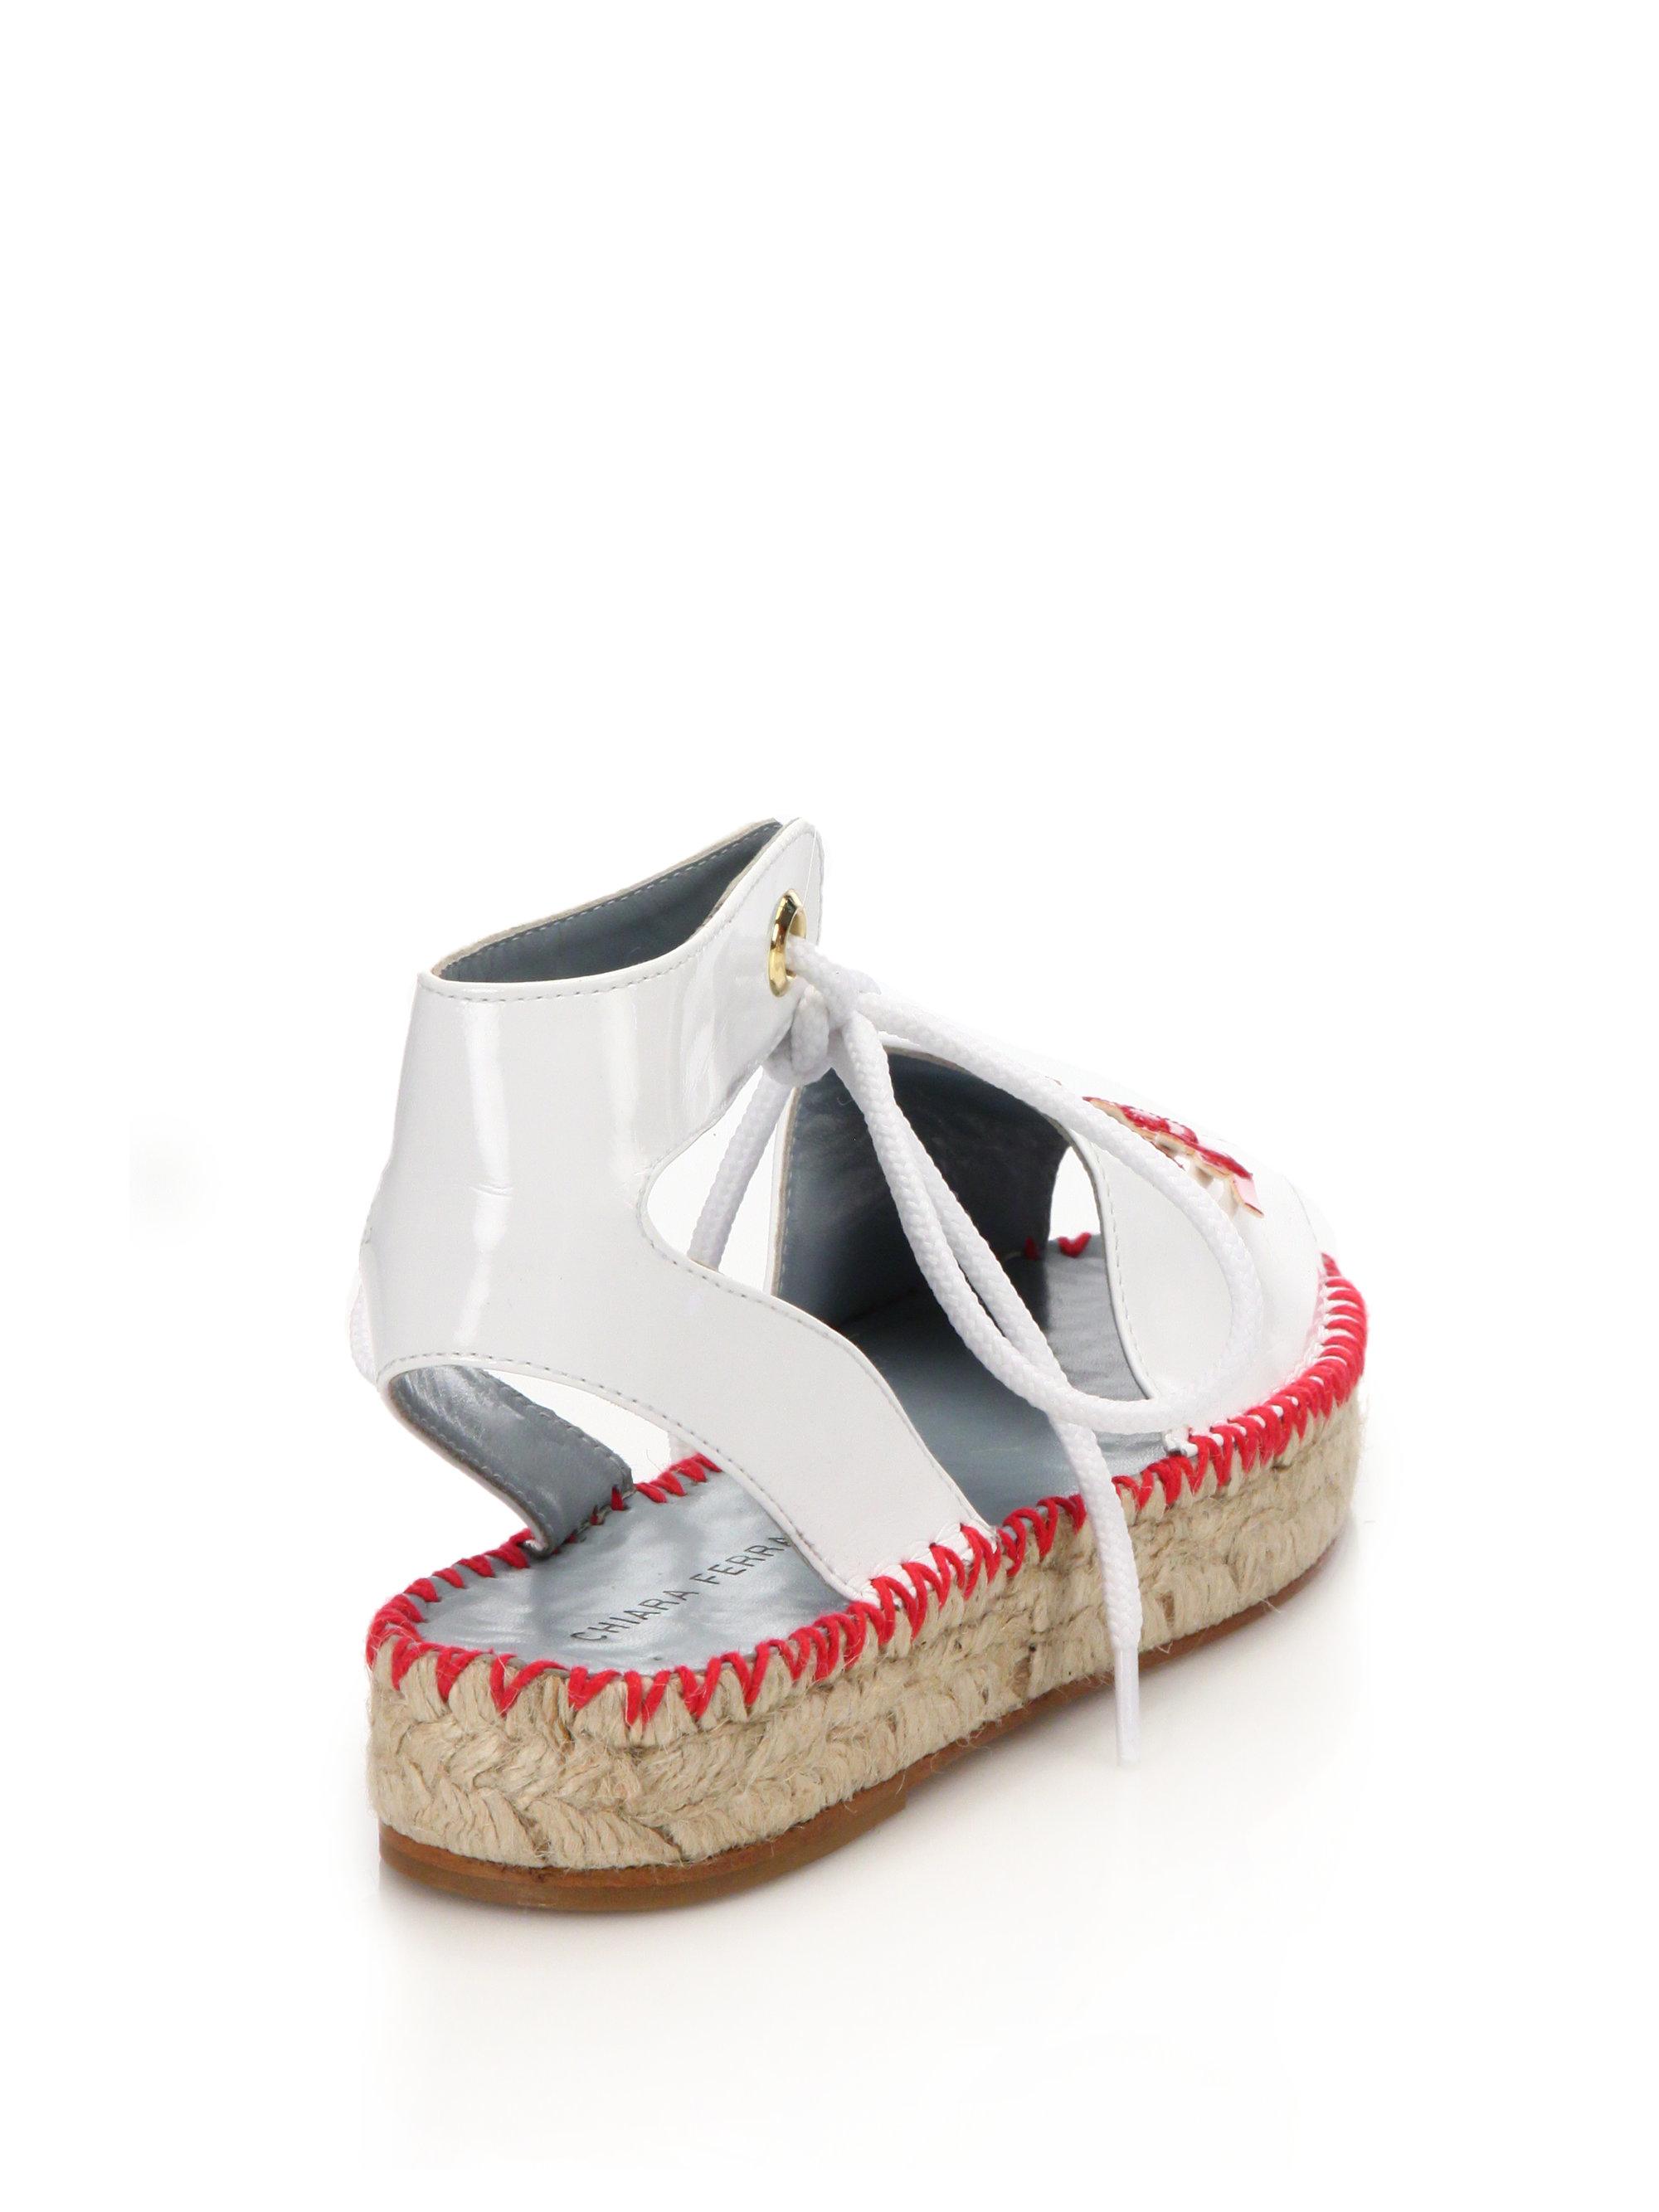 Lyst Chiara Ferragni Wink Patent Leather Espadrille Sandals